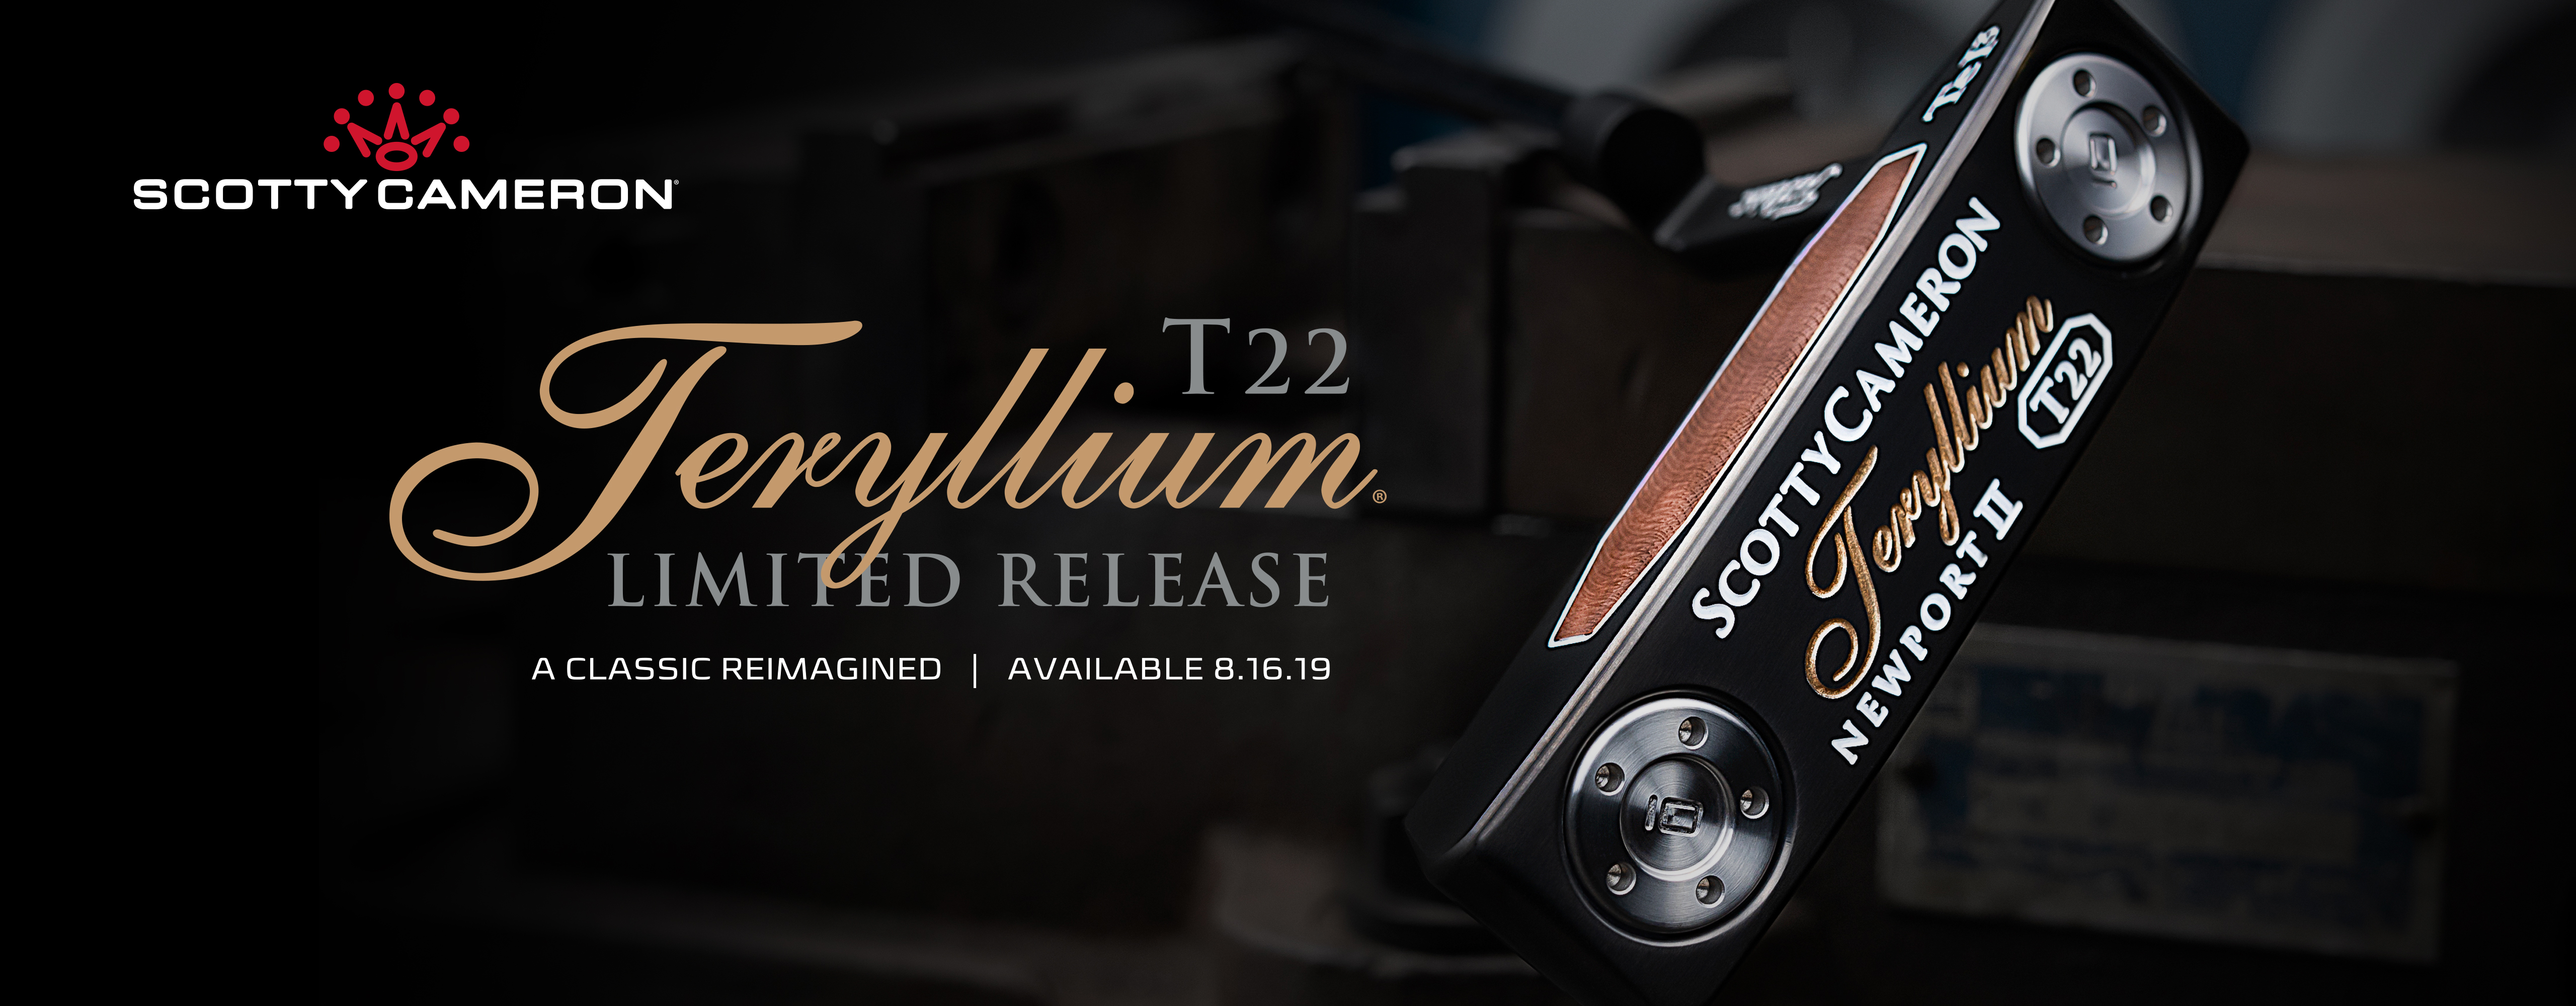 ScottyCameron-TE22-Banner-5120x2000